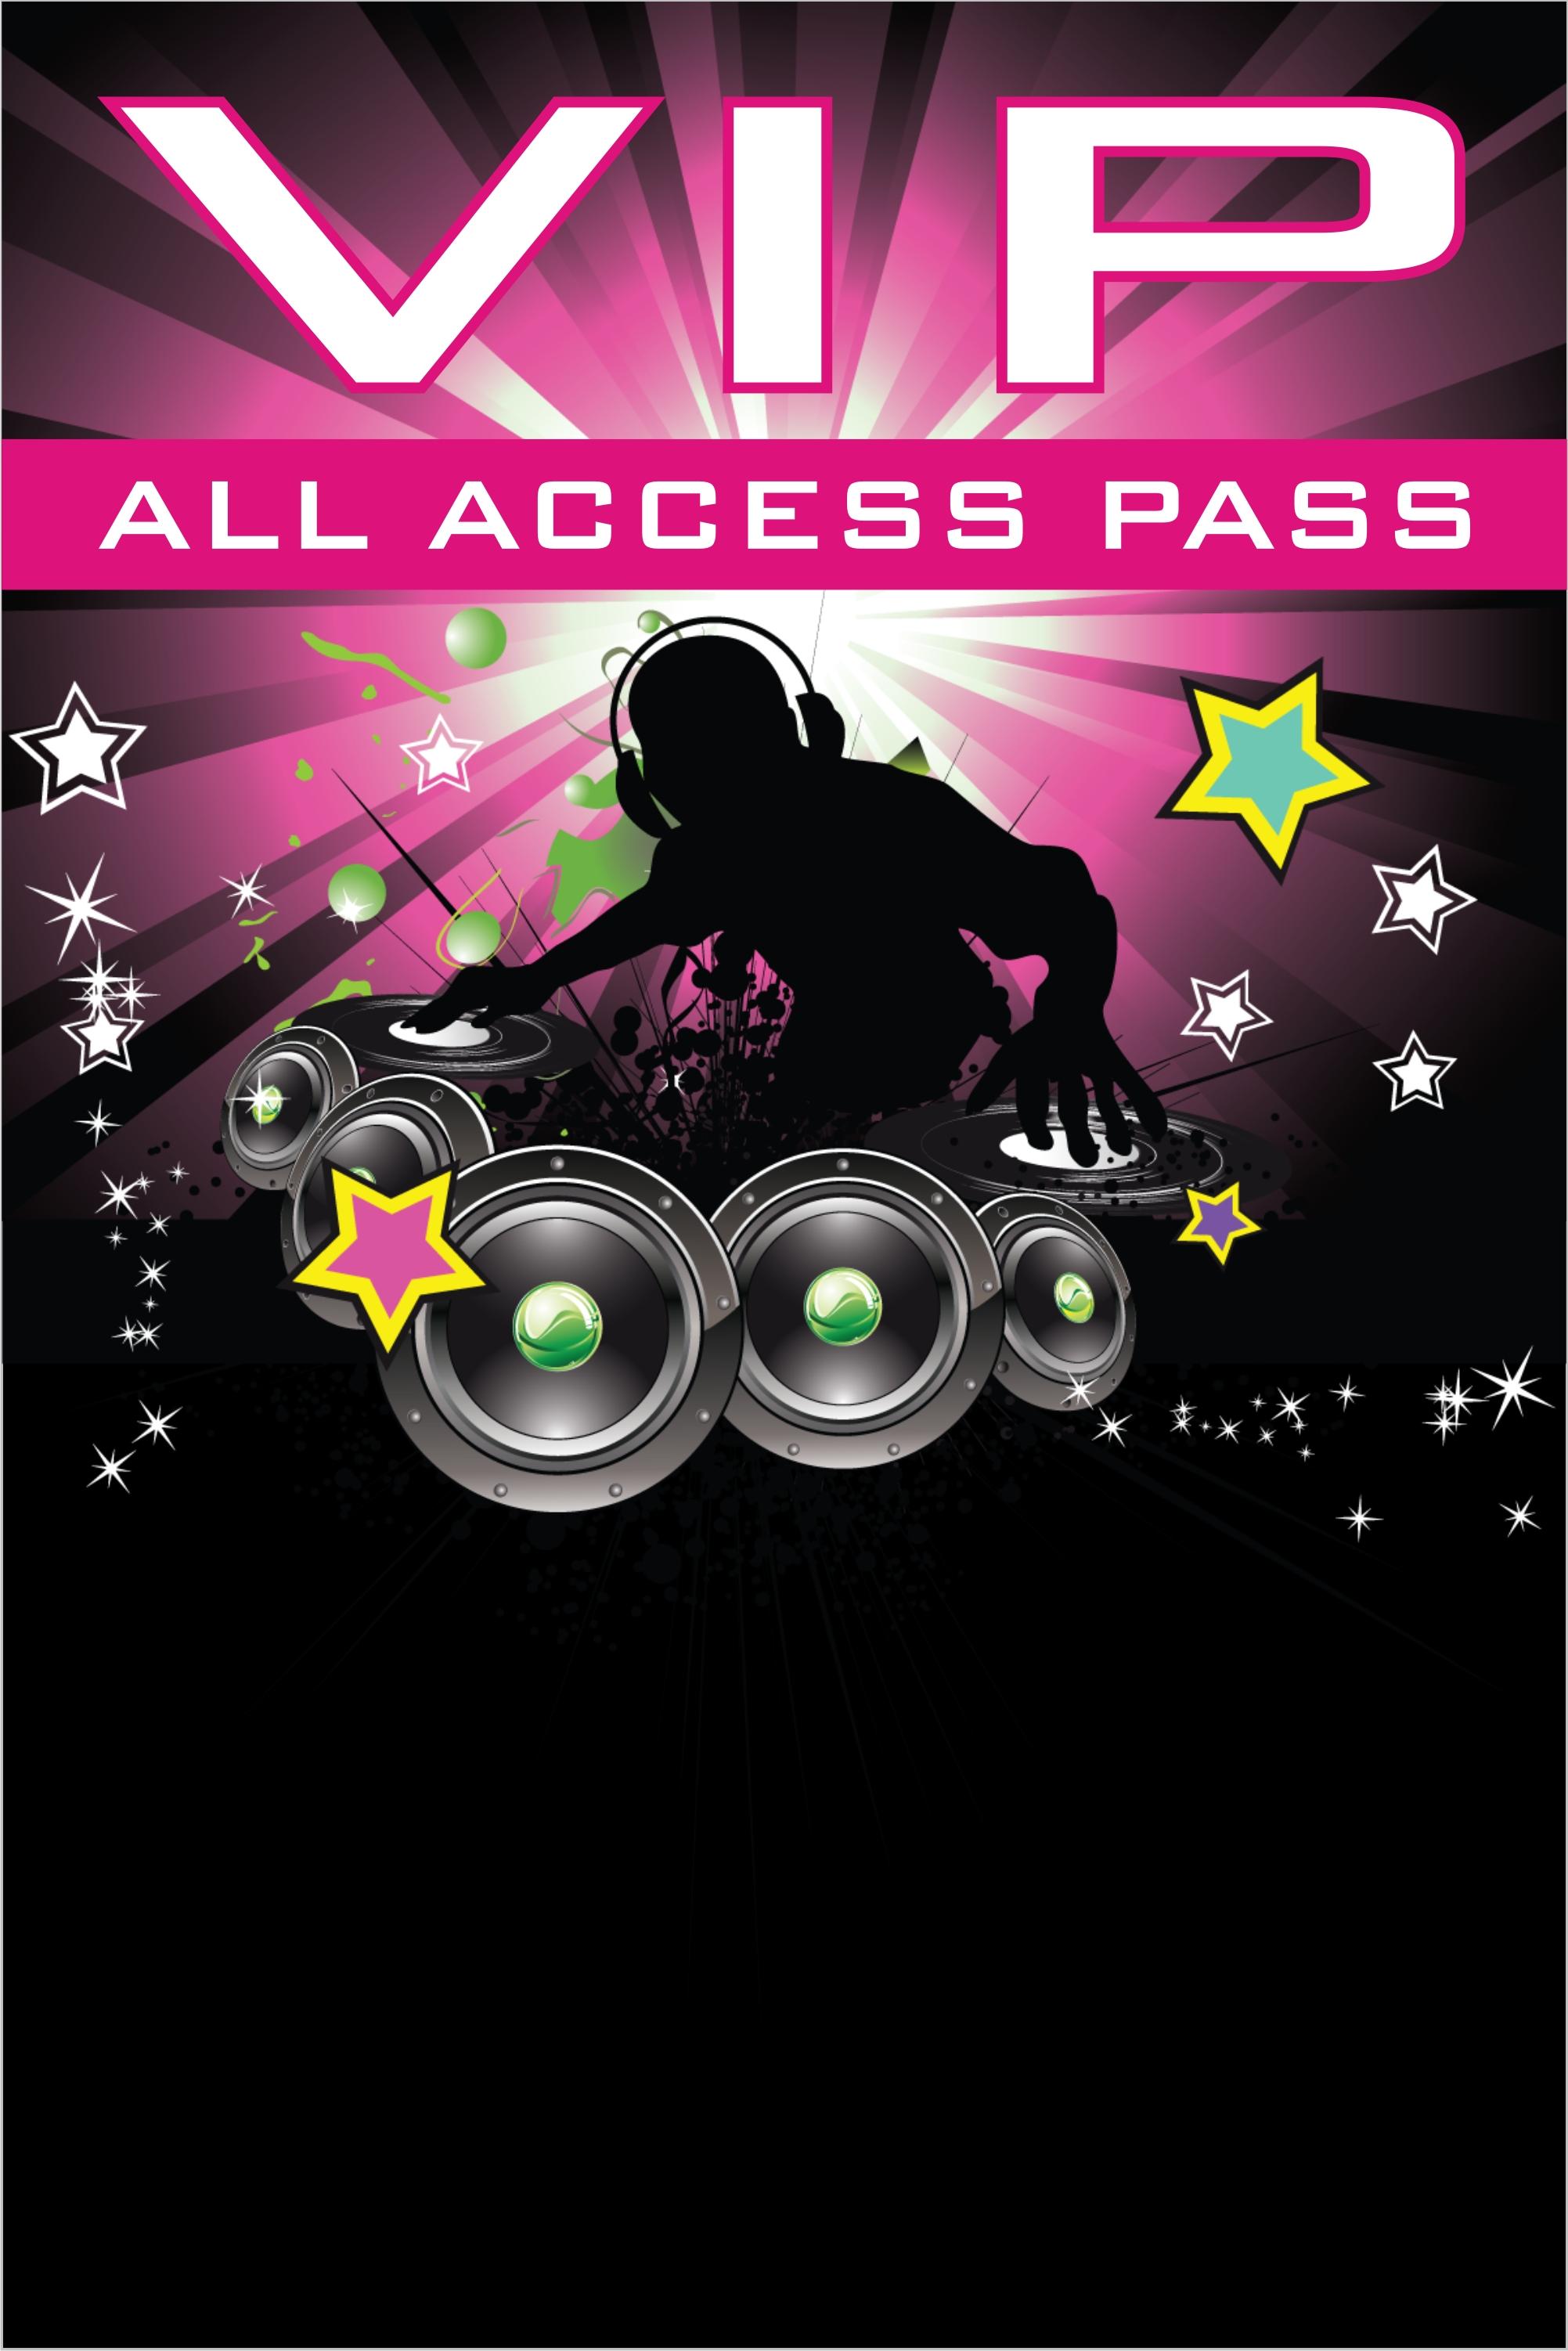 Nightclub DJ Dance Party VIP Pass Invitation w Lanyard ...